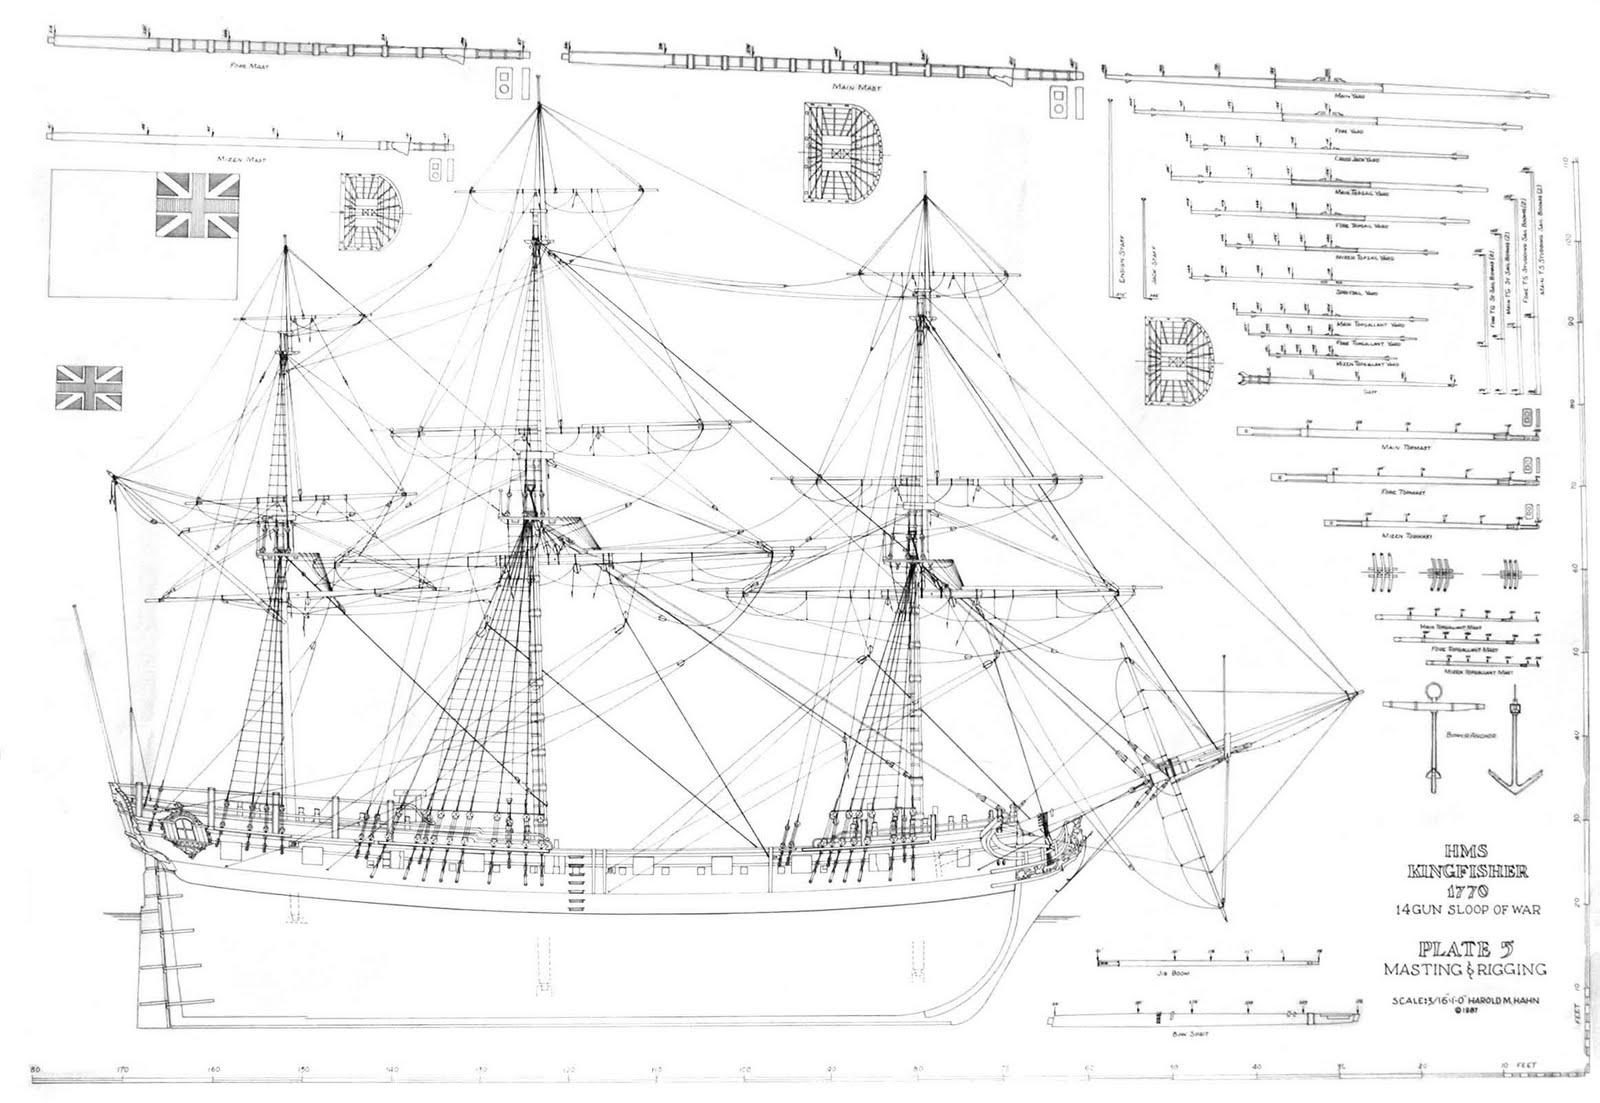 чертеж модели корабля куракина устроиться водителем прокатиться